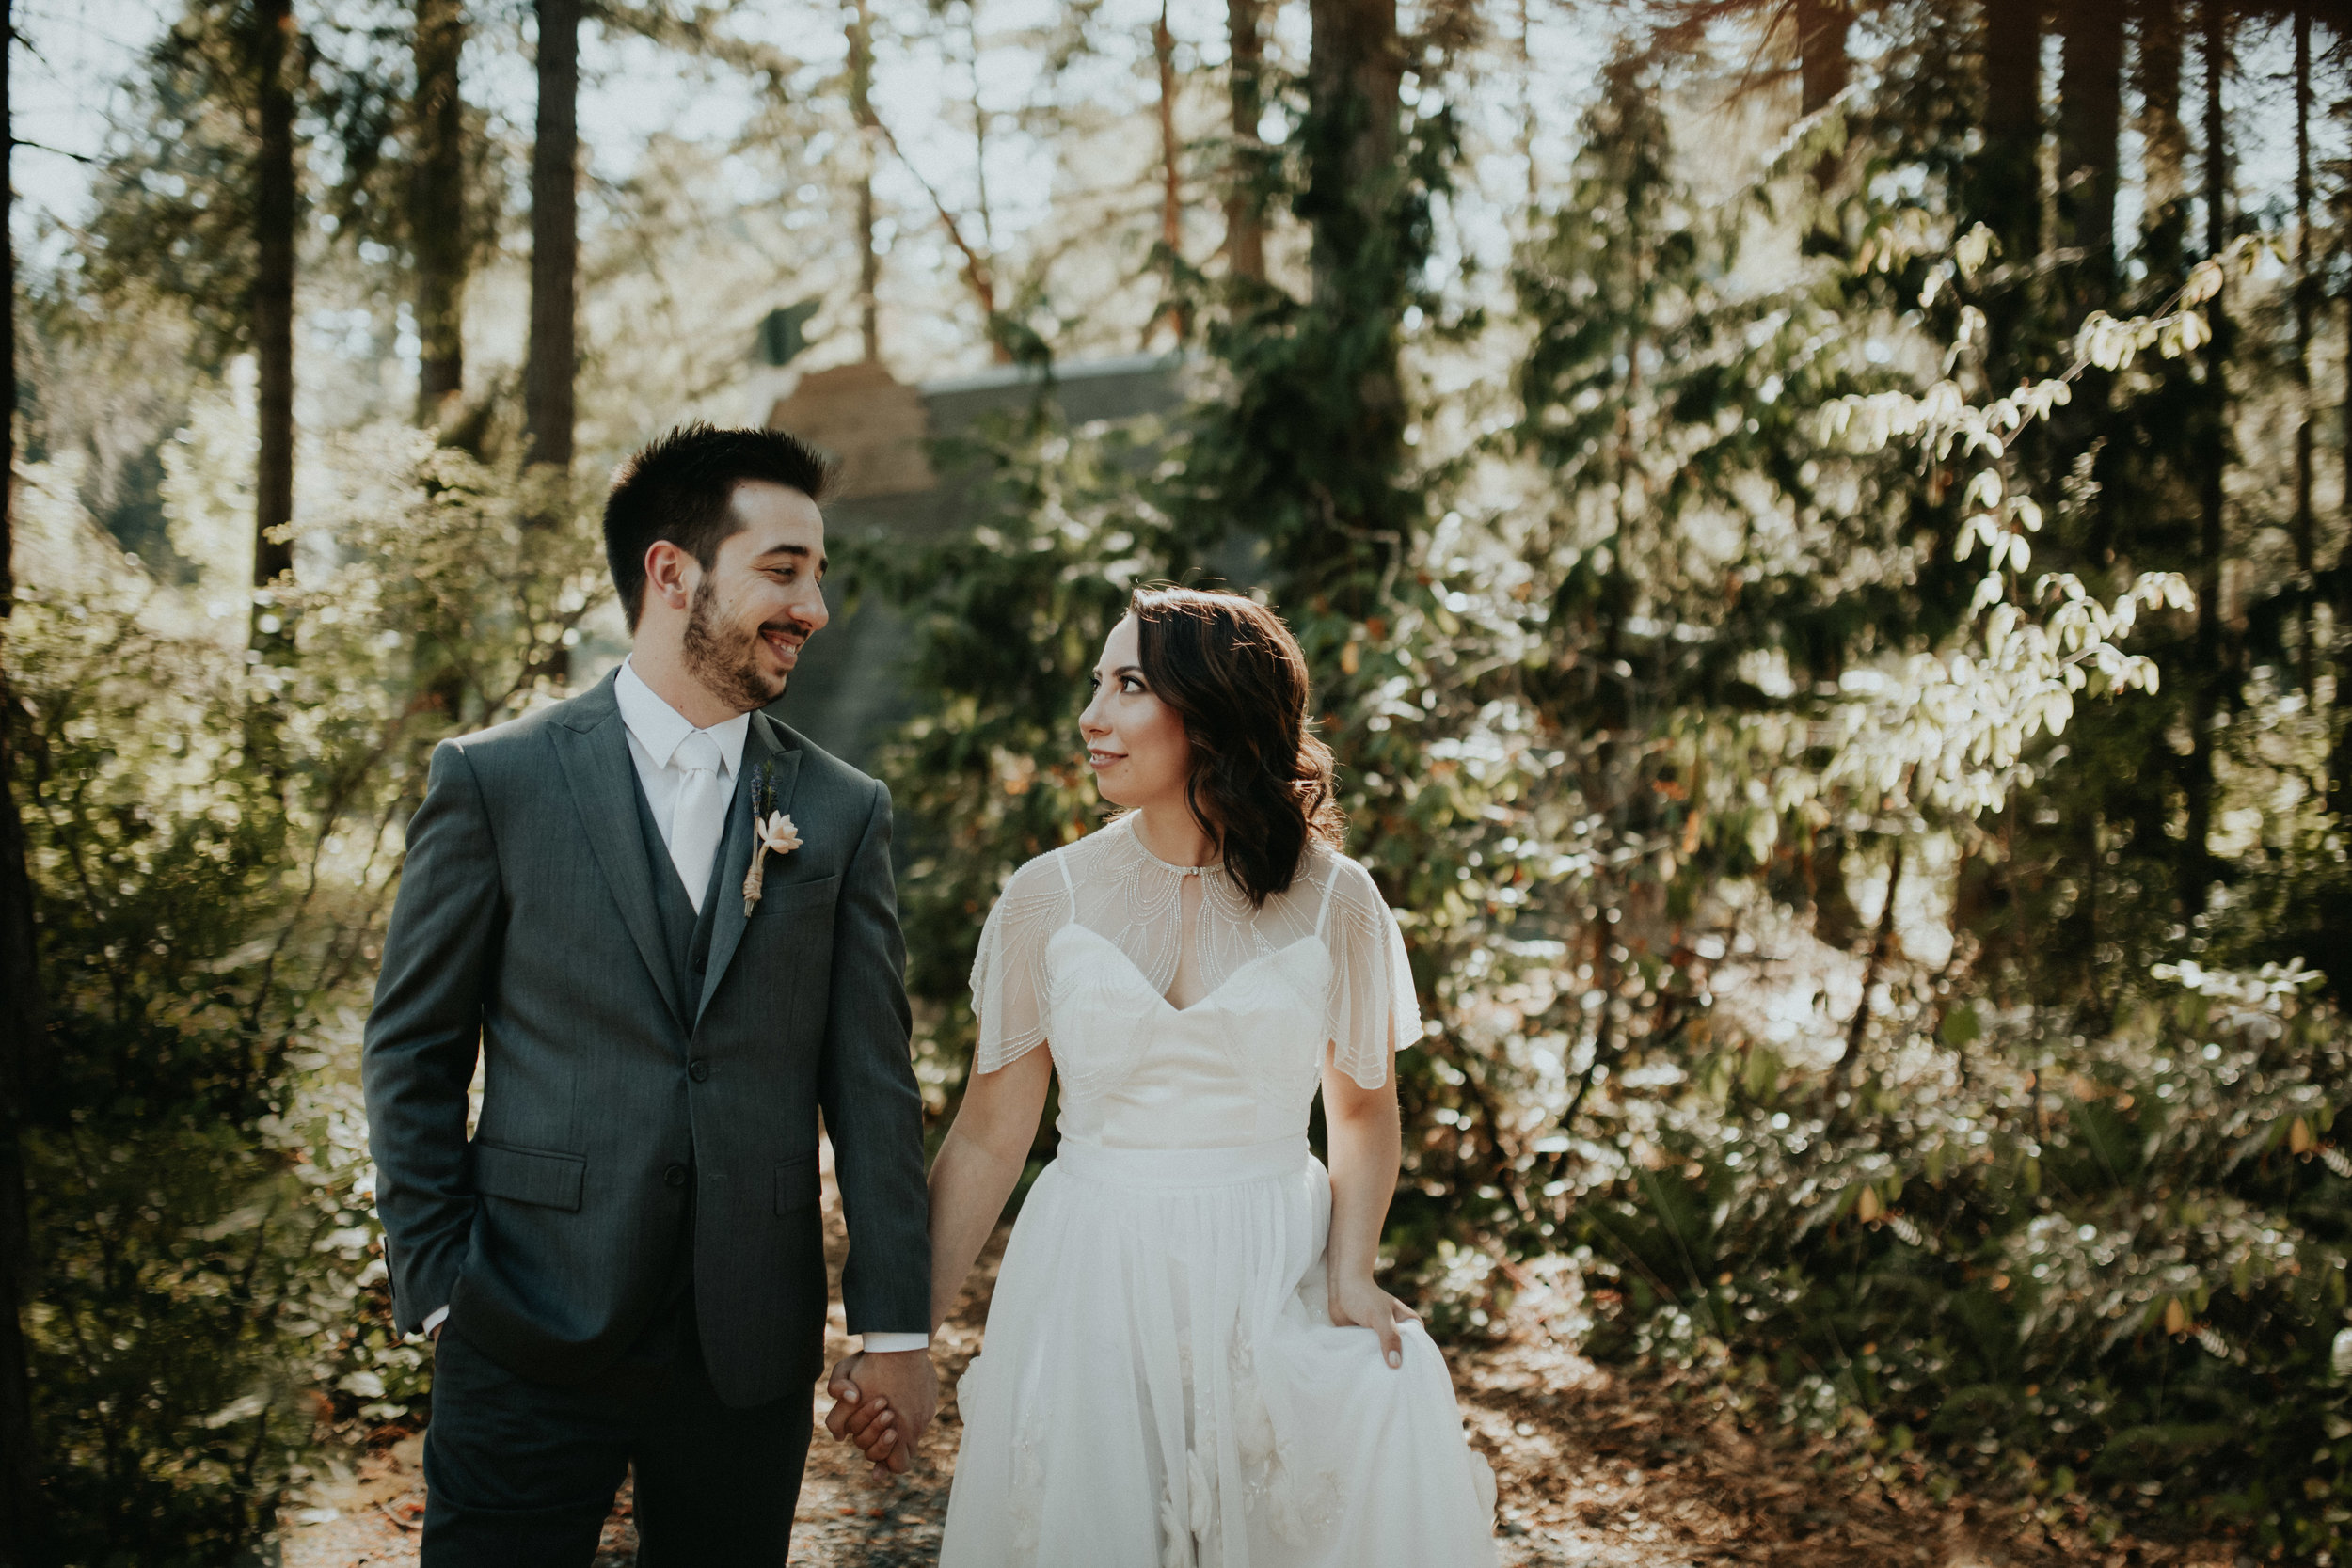 seattle wedding photographer   olympia, wa   small wedding   small wedding venues seattle   intimate wedding photographer